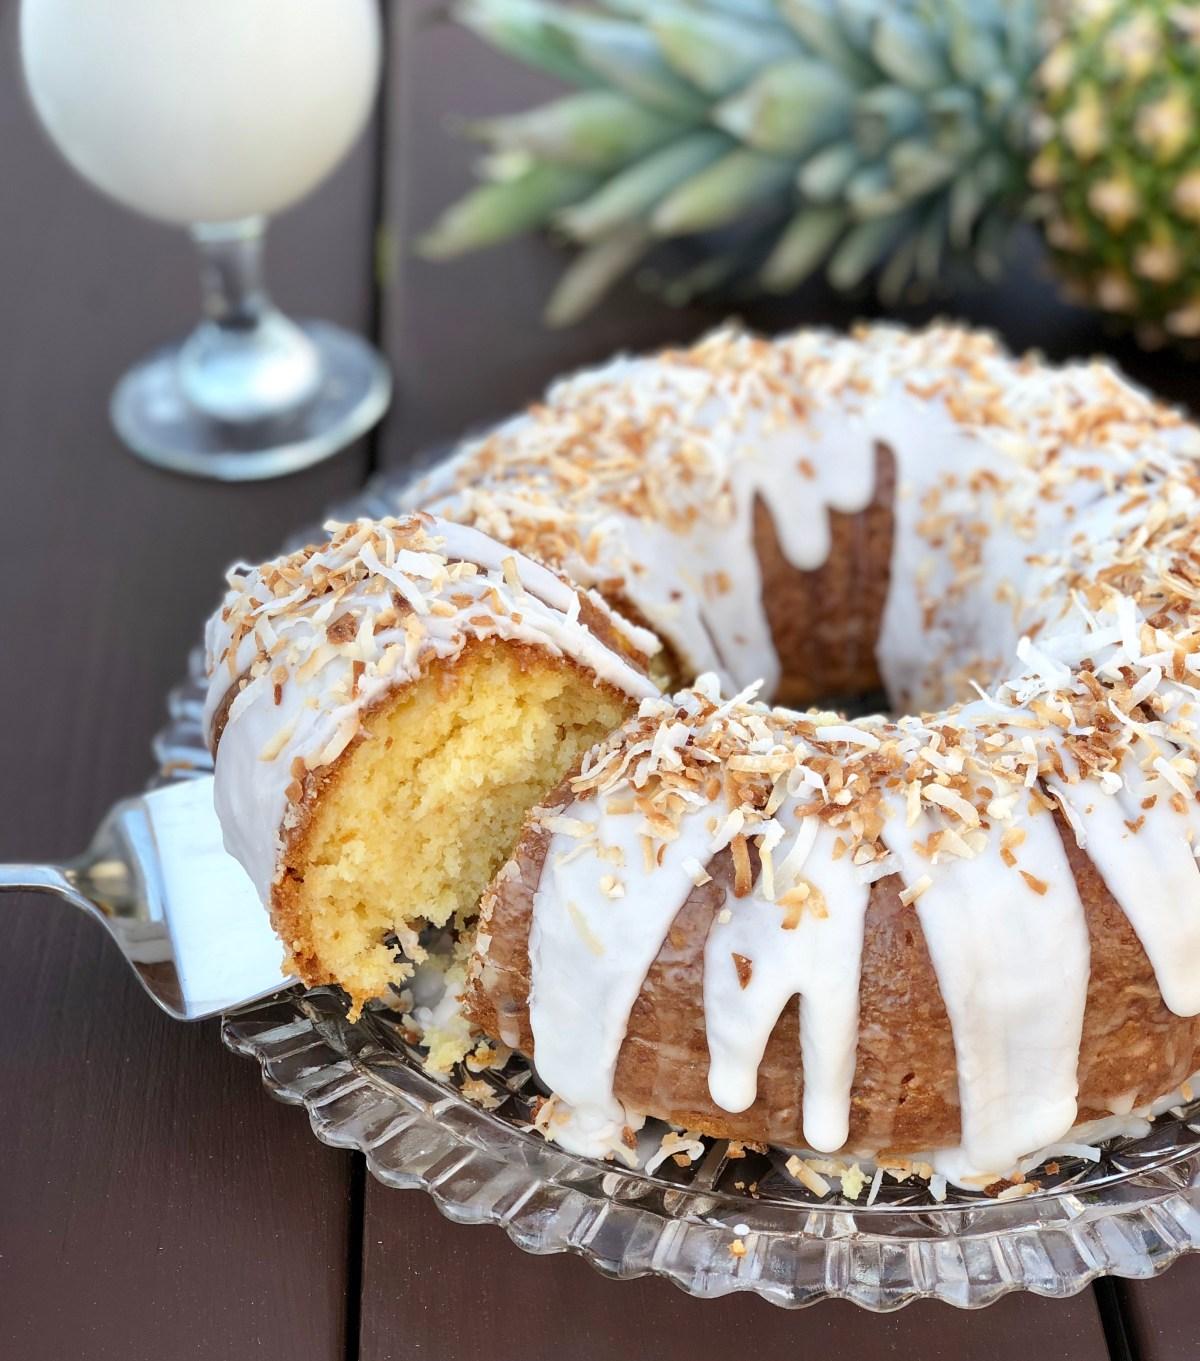 Pina Colada Cake by Happylifeblogspot.com #pinacolada #bundtcake #pinacoladacake #summerdessert #cakemixrecipes #coconutcake #pineapplecake